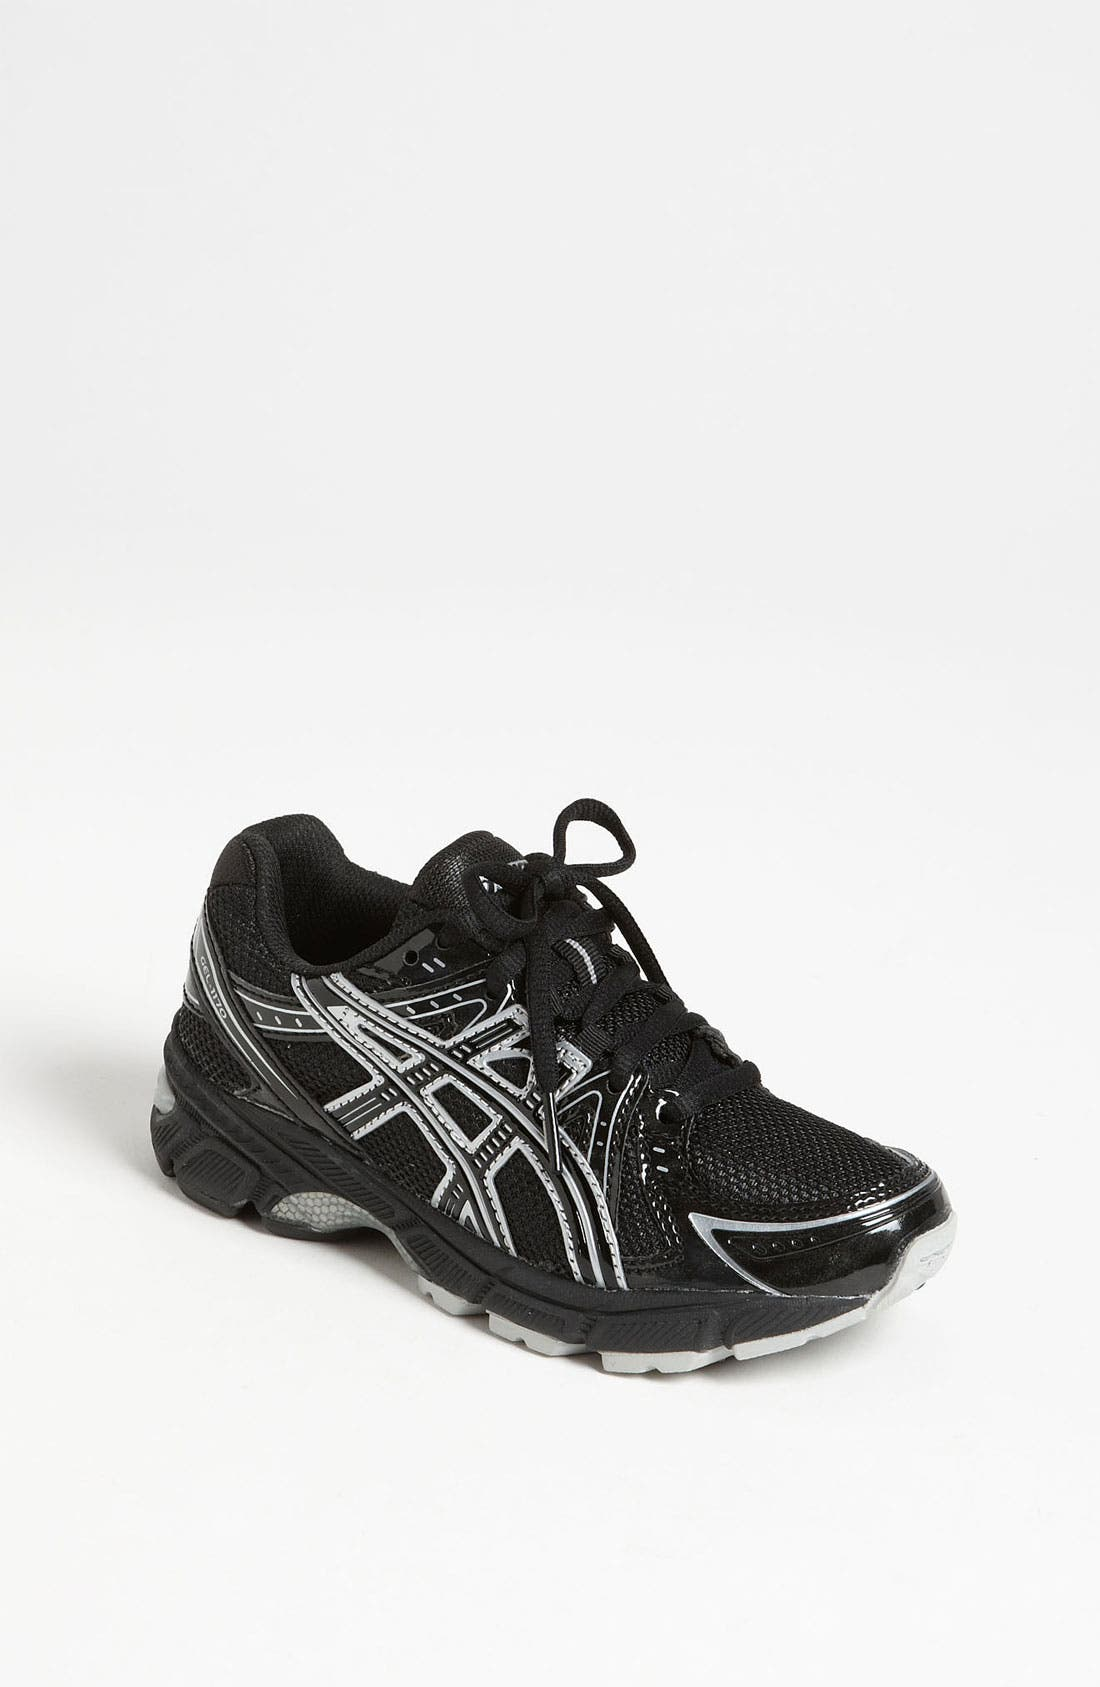 Alternate Image 1 Selected - ASICS® 'GEL®-1170™' Running Shoe (Little Kid & Big Kid)